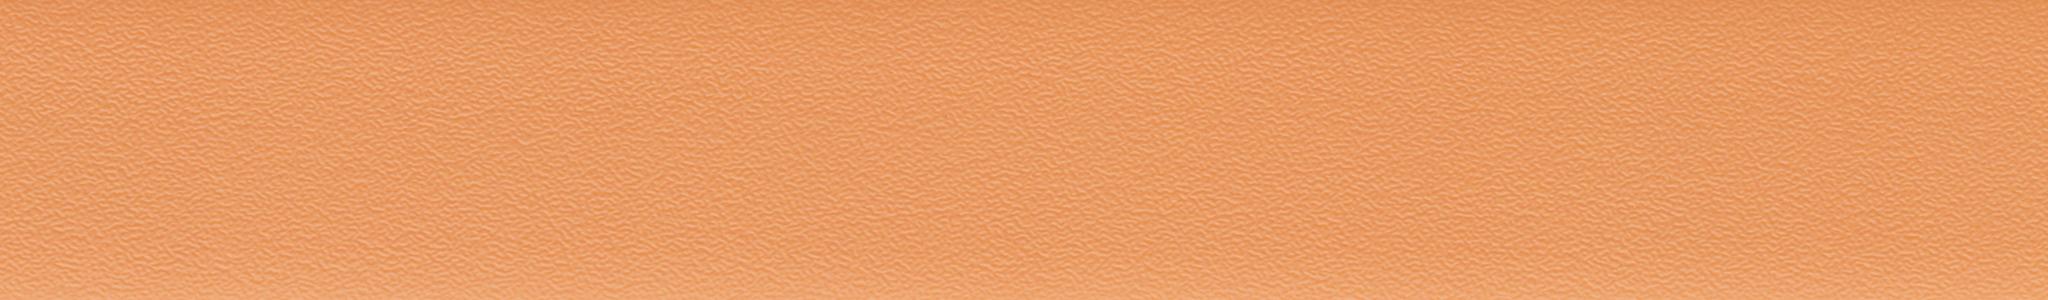 HU 141667 кромка ABS оранжевая жемчуг 101